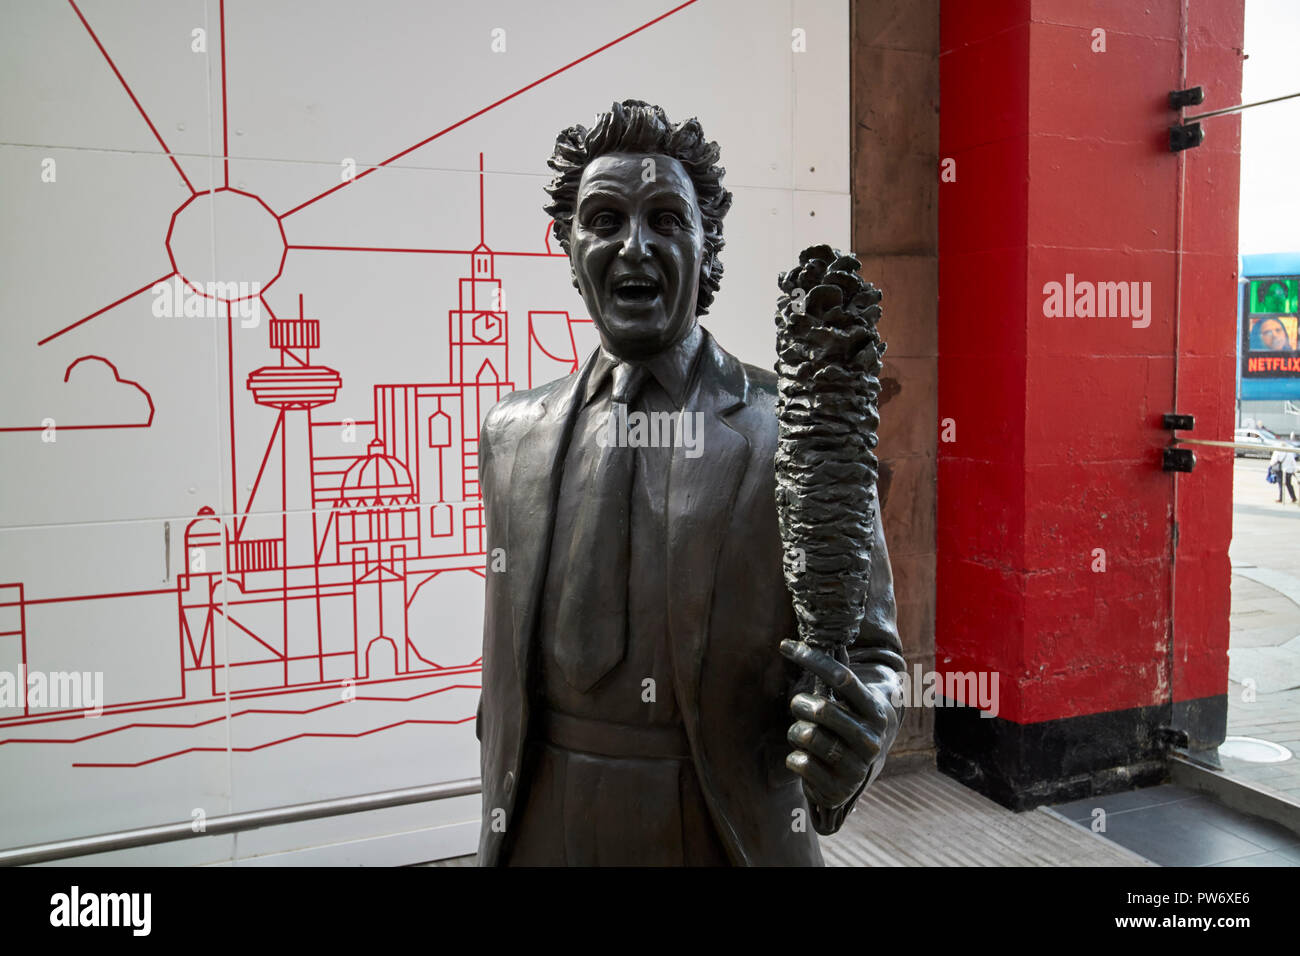 Ken Dodd statue at Lime Street station Liverpool Merseyside England UK - Stock Image